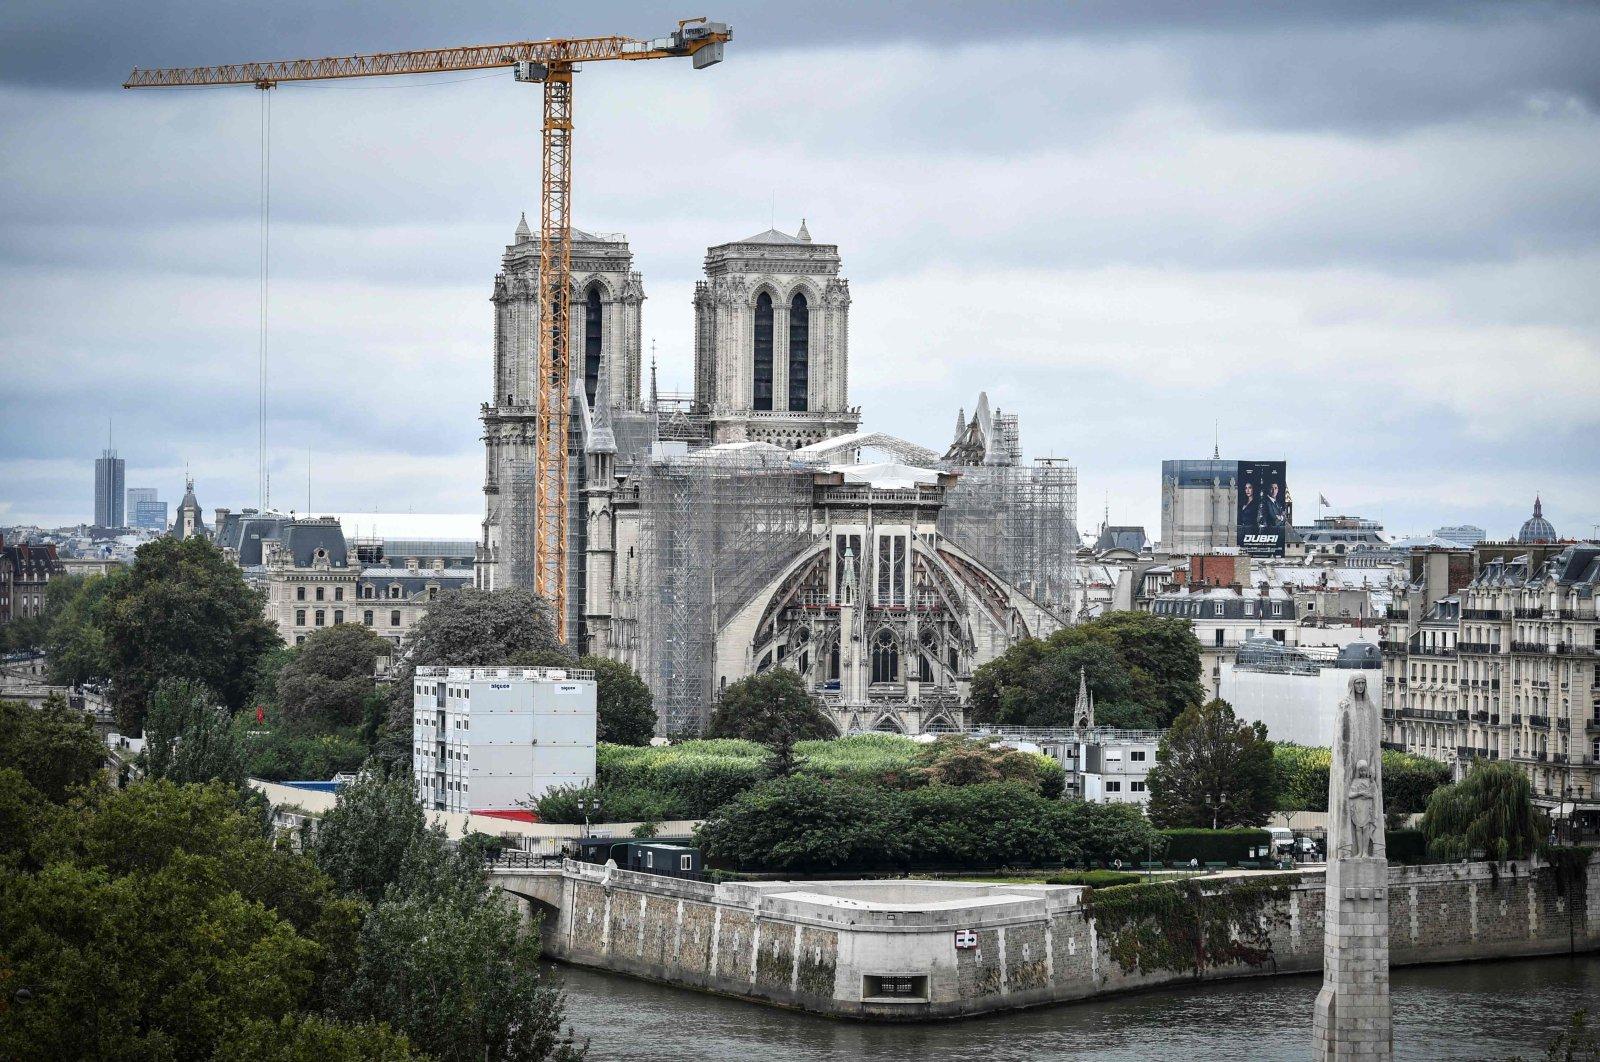 A giant crane outside Notre-Dame Cathedral, Paris, France, Aug. 19, 2021. (AFP Photo)